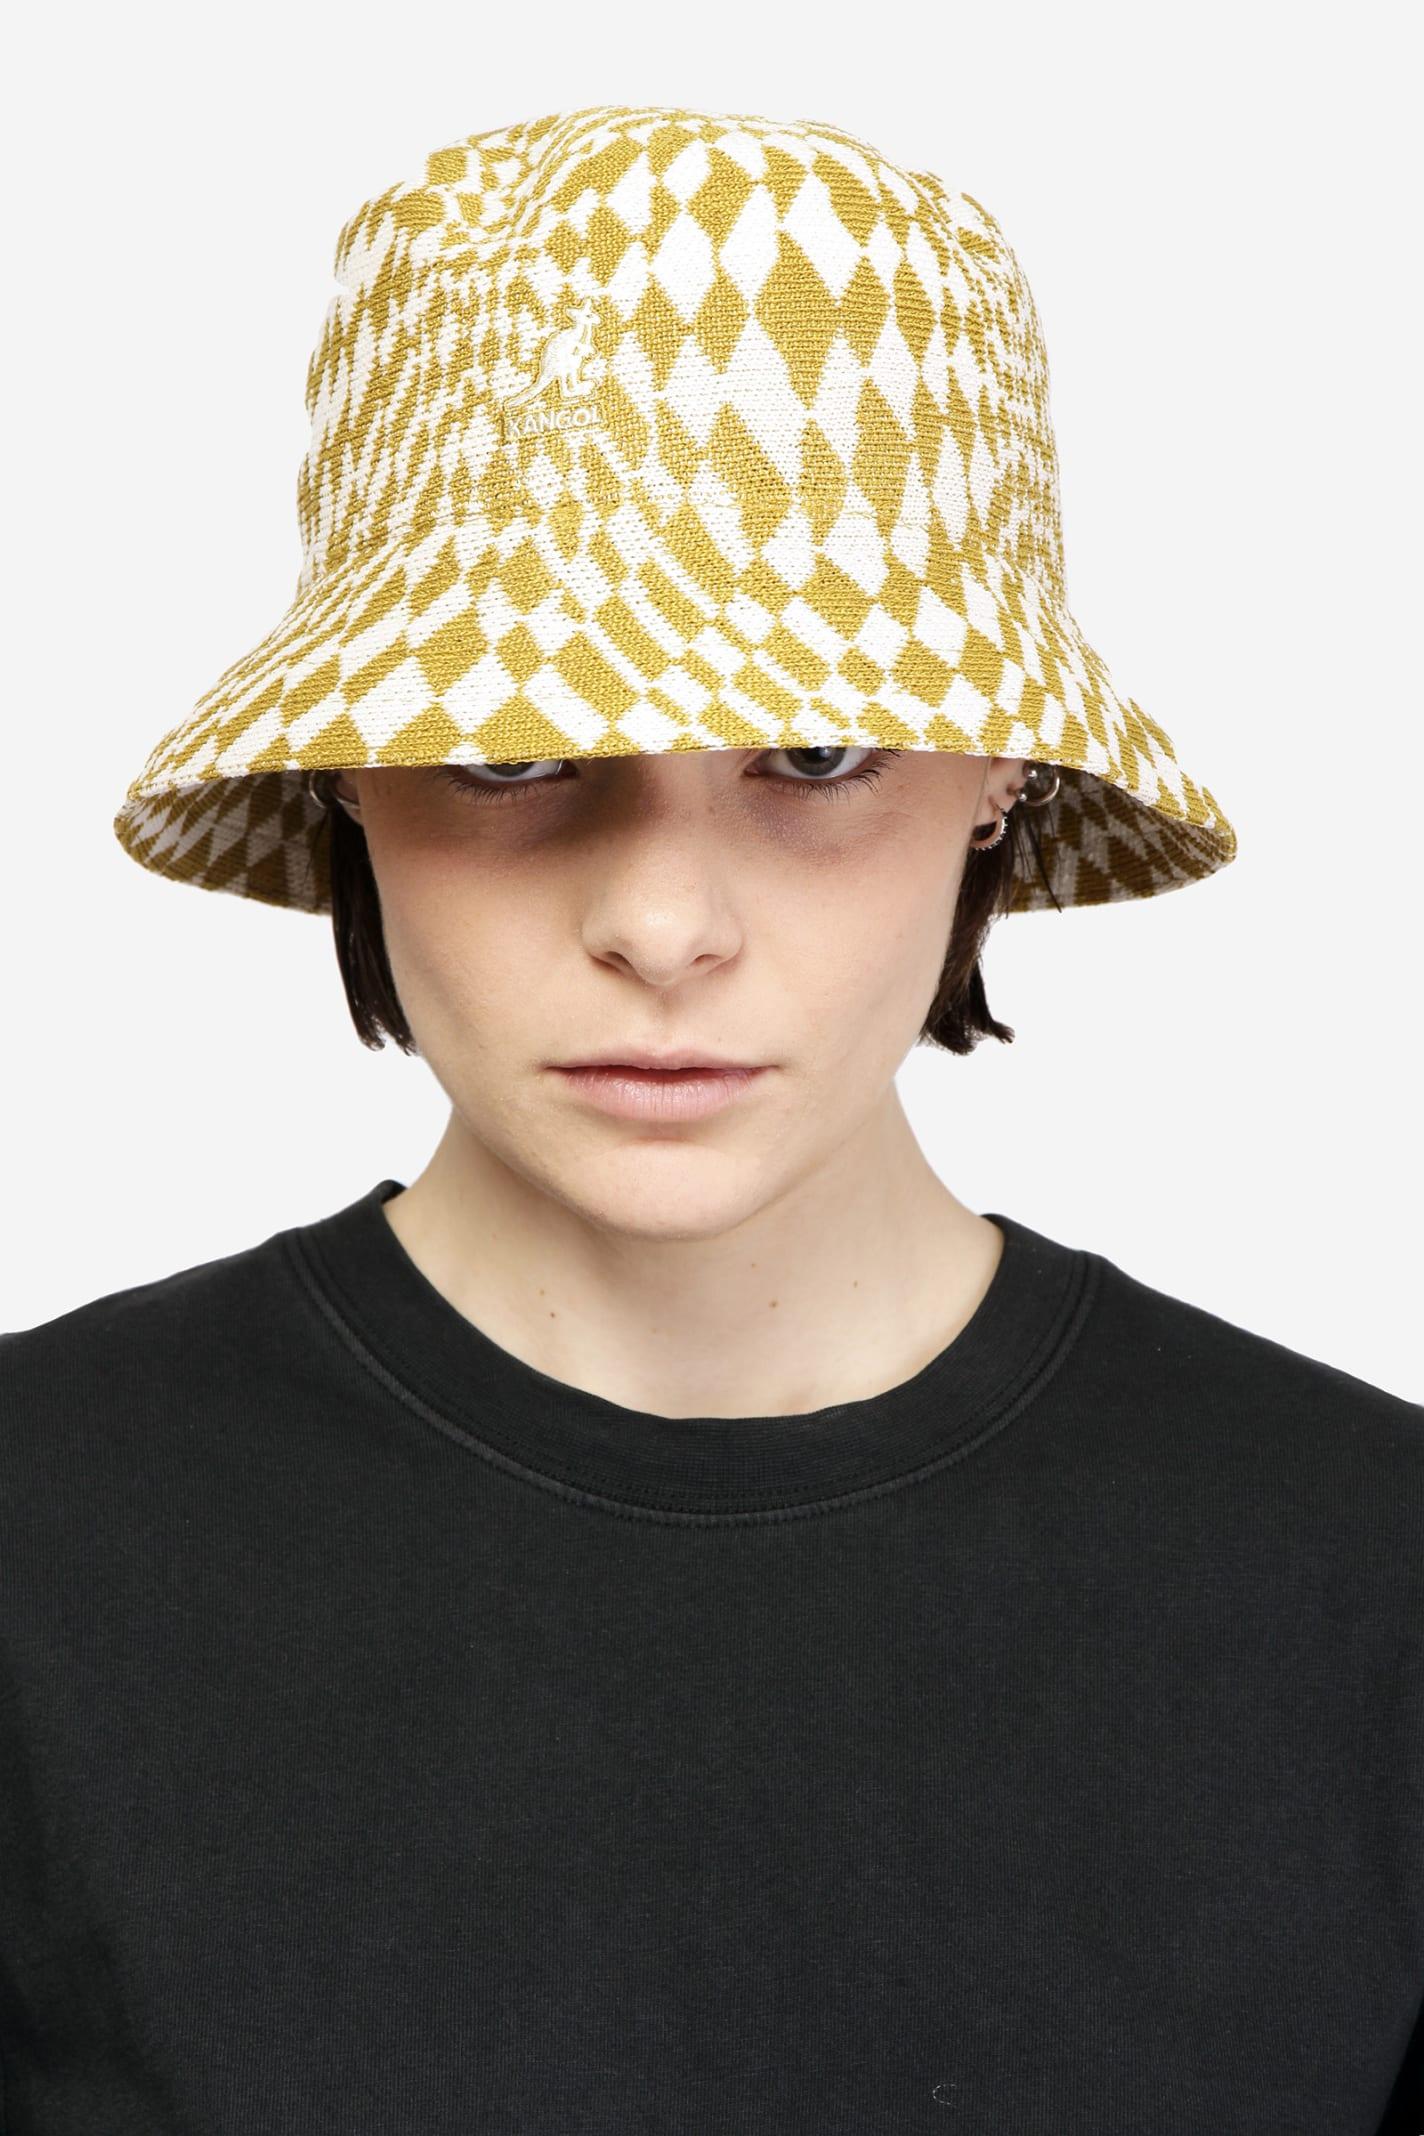 Warped Check Hats